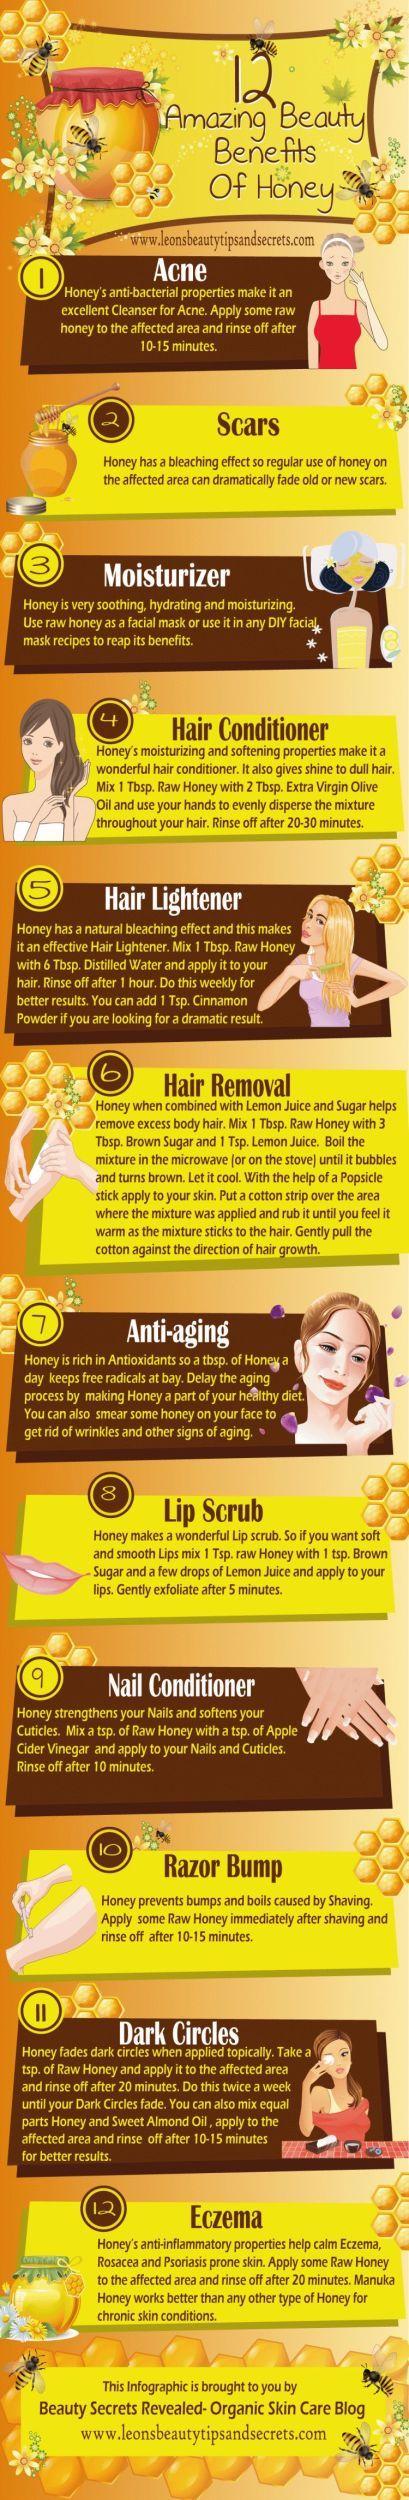 Sweet! 12 Amazing Beauty Benefits Of Honey Infographic - Acne, scars, moisturizer, hair conditioner lightener, anti-aging, lip nail conditioner, dark circles, eczema.